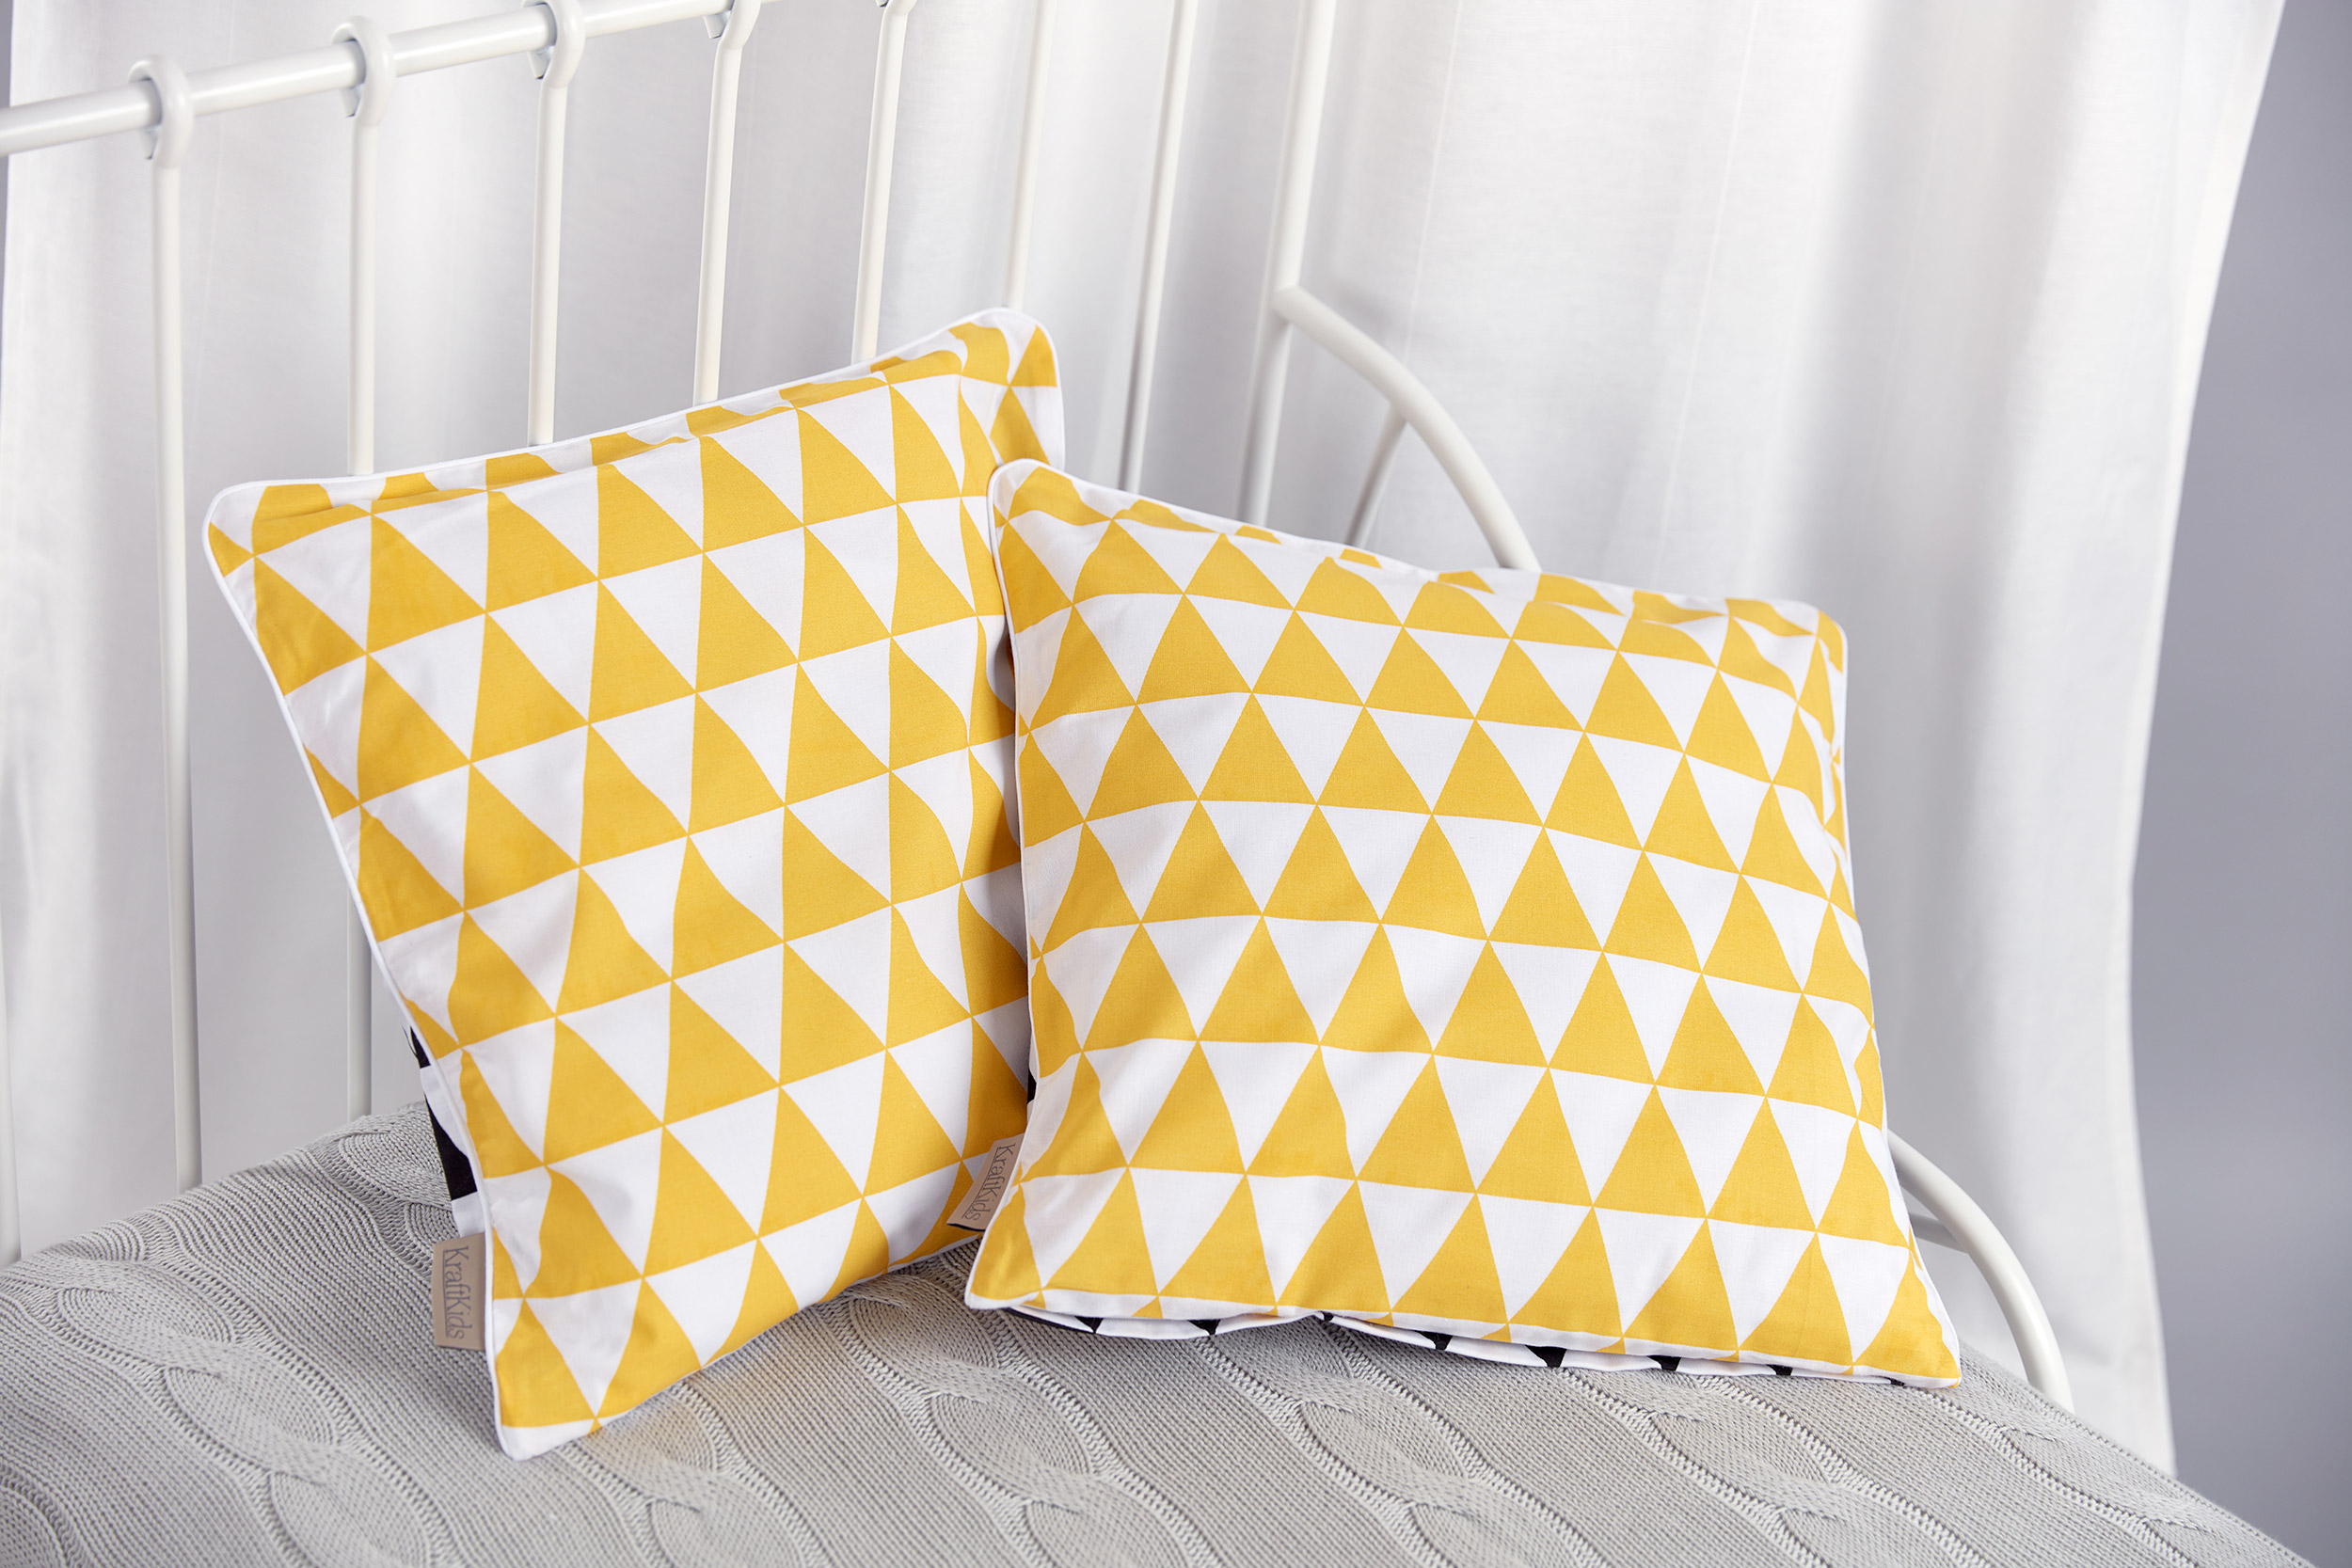 KraftKids Kissenbezug gelbe Dreiecke und schwarze Dreiecke